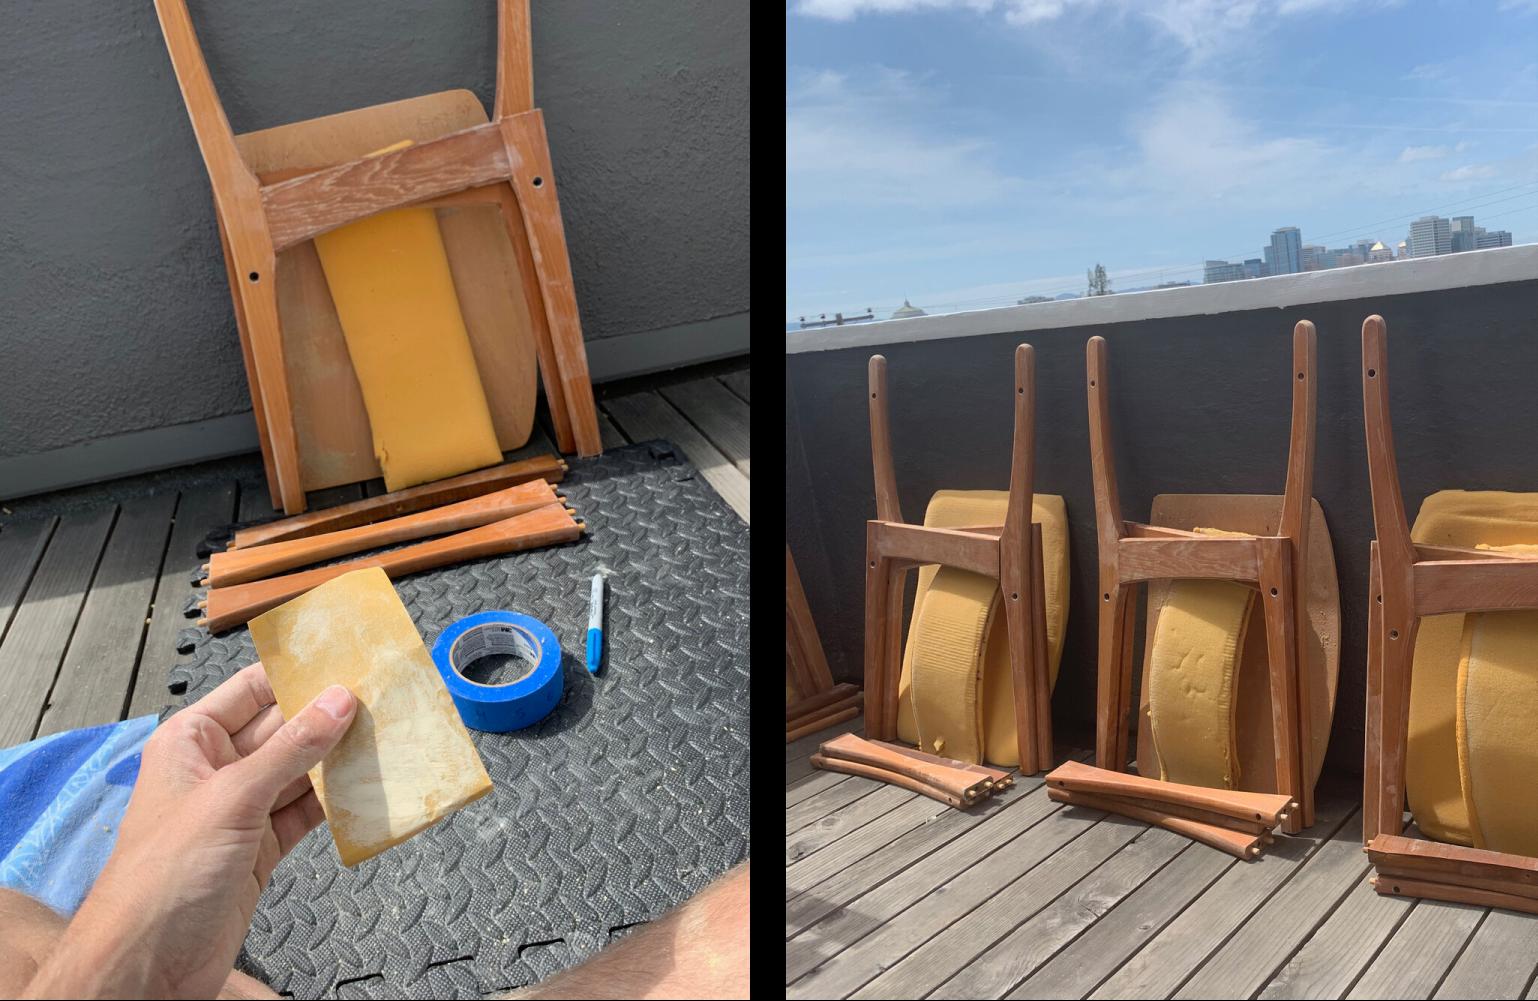 Photos of chair wood sanding process